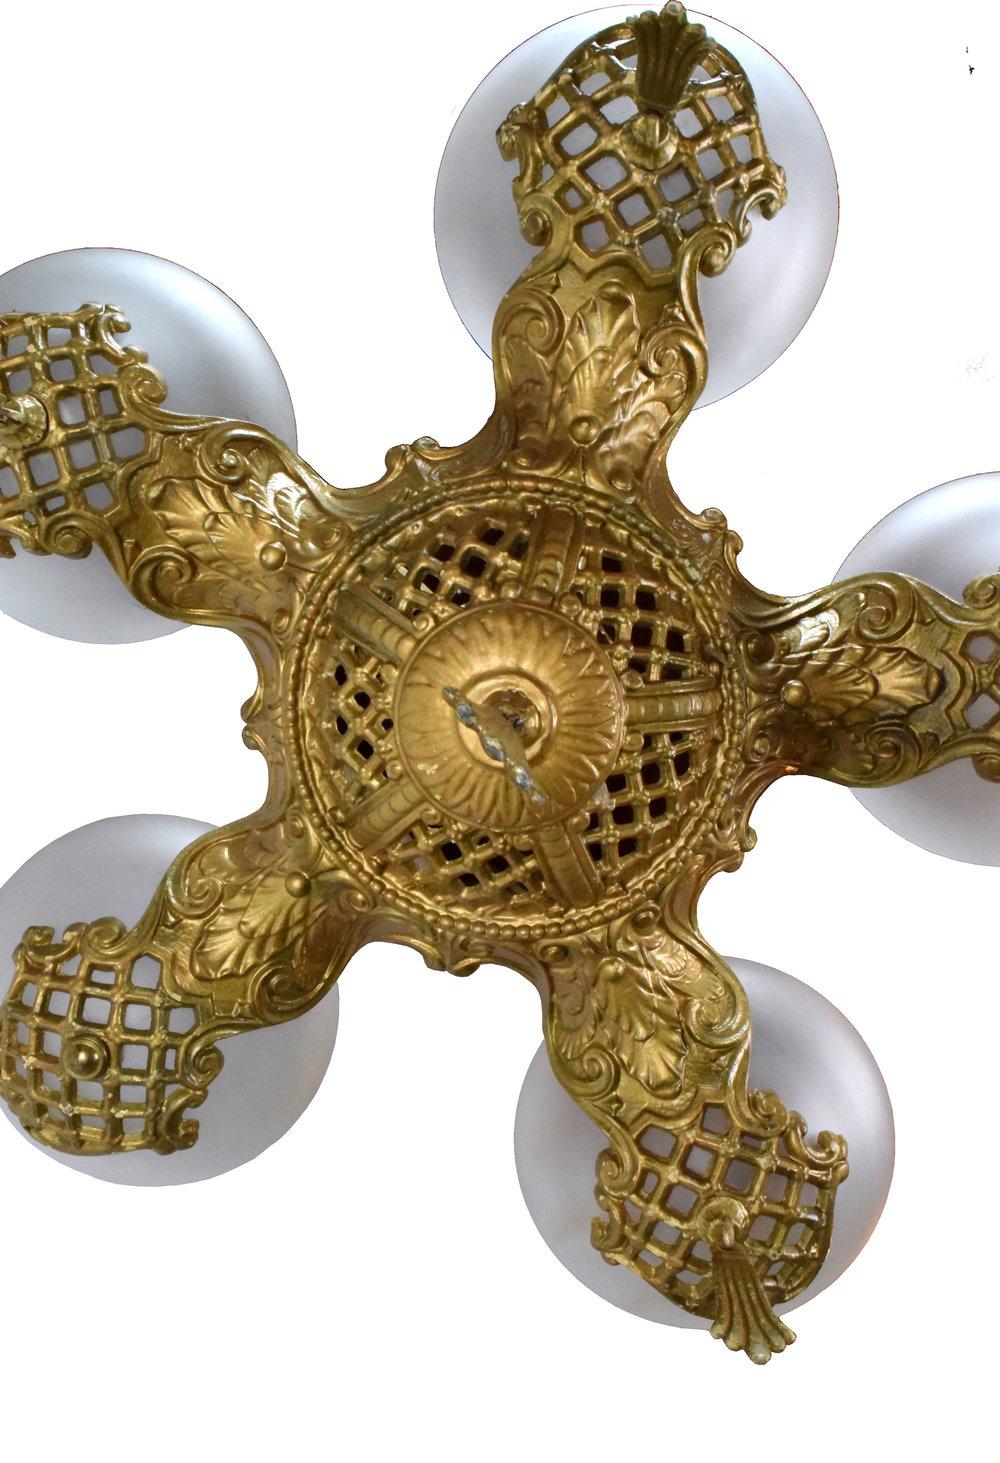 46566-art-deco-brass-chandelier-bottom-view.jpg